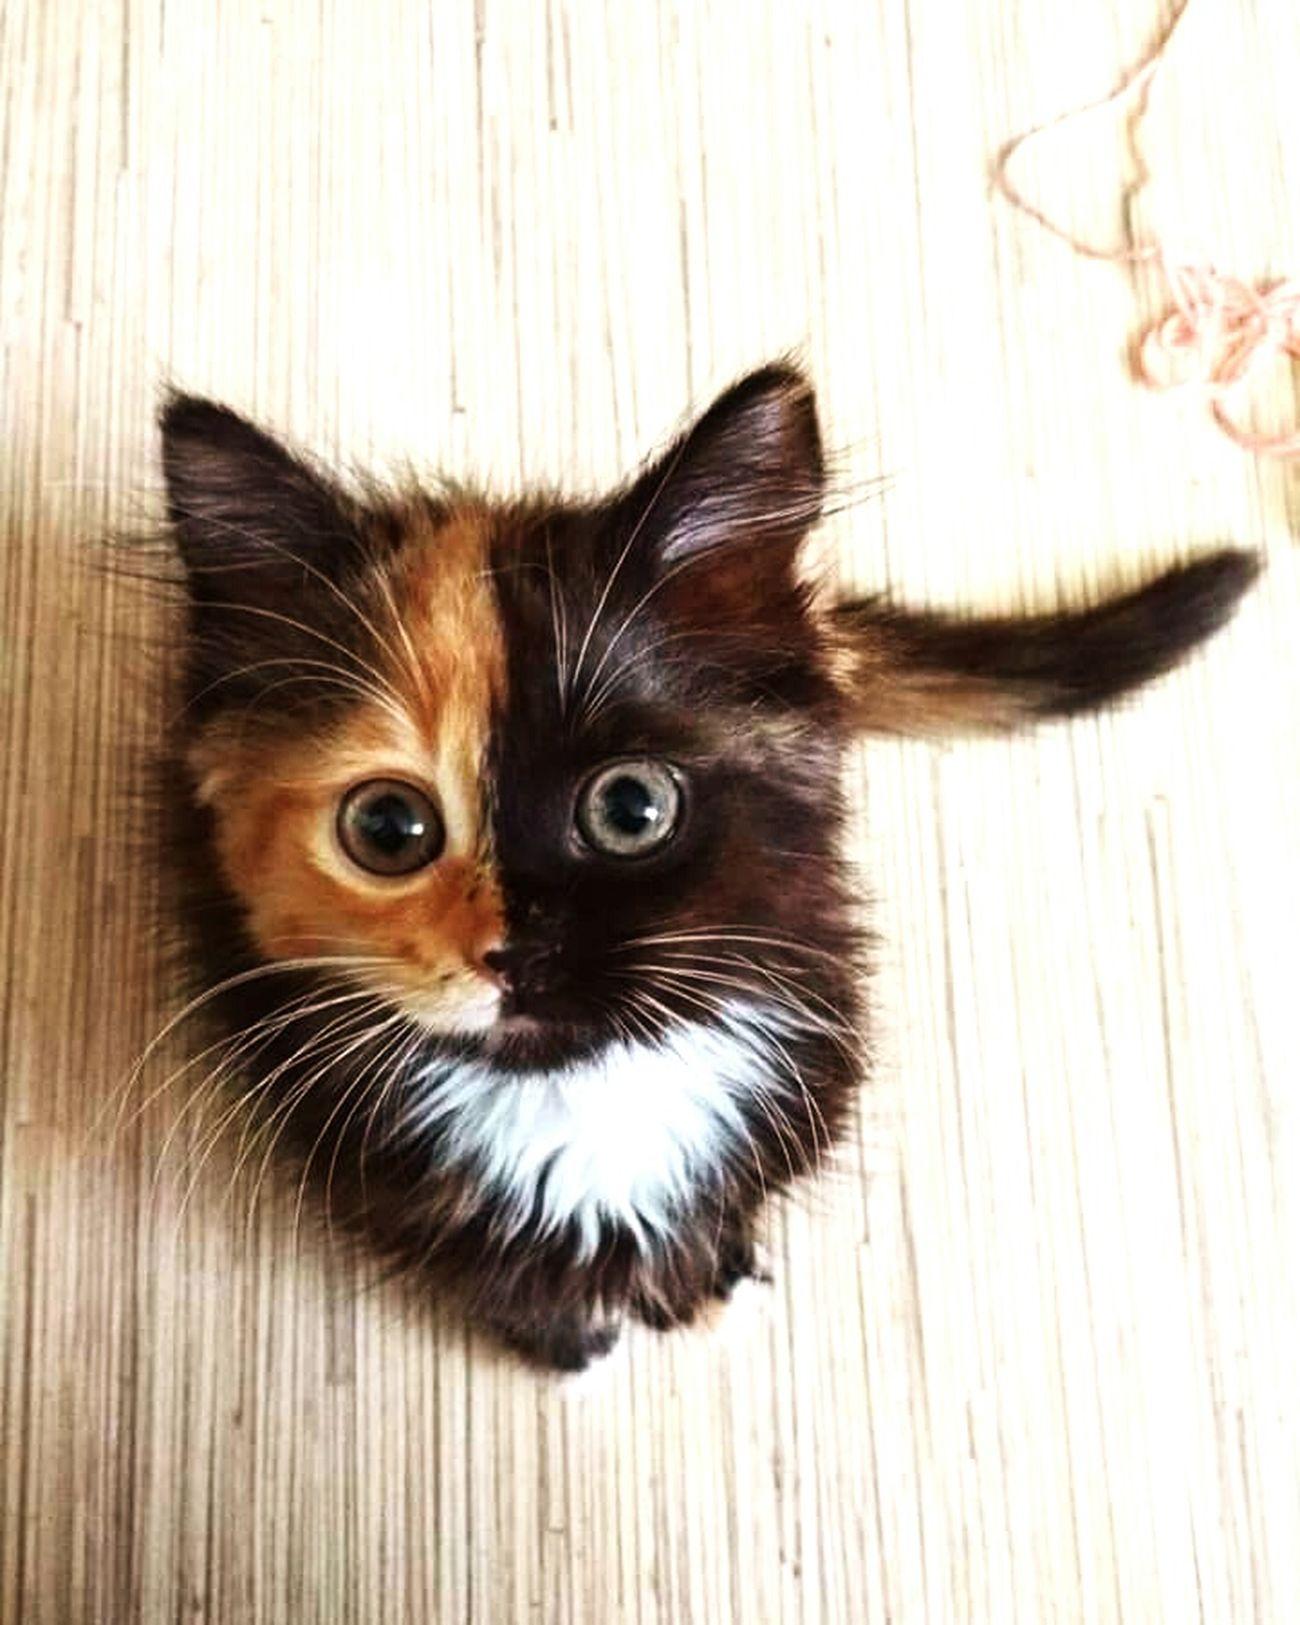 cute cat Domestic Cat Pets Indoors  Looking At Camera Catsagram Catlover Cat Photography Catportrait Catholic Cateyes Catsoftheworld